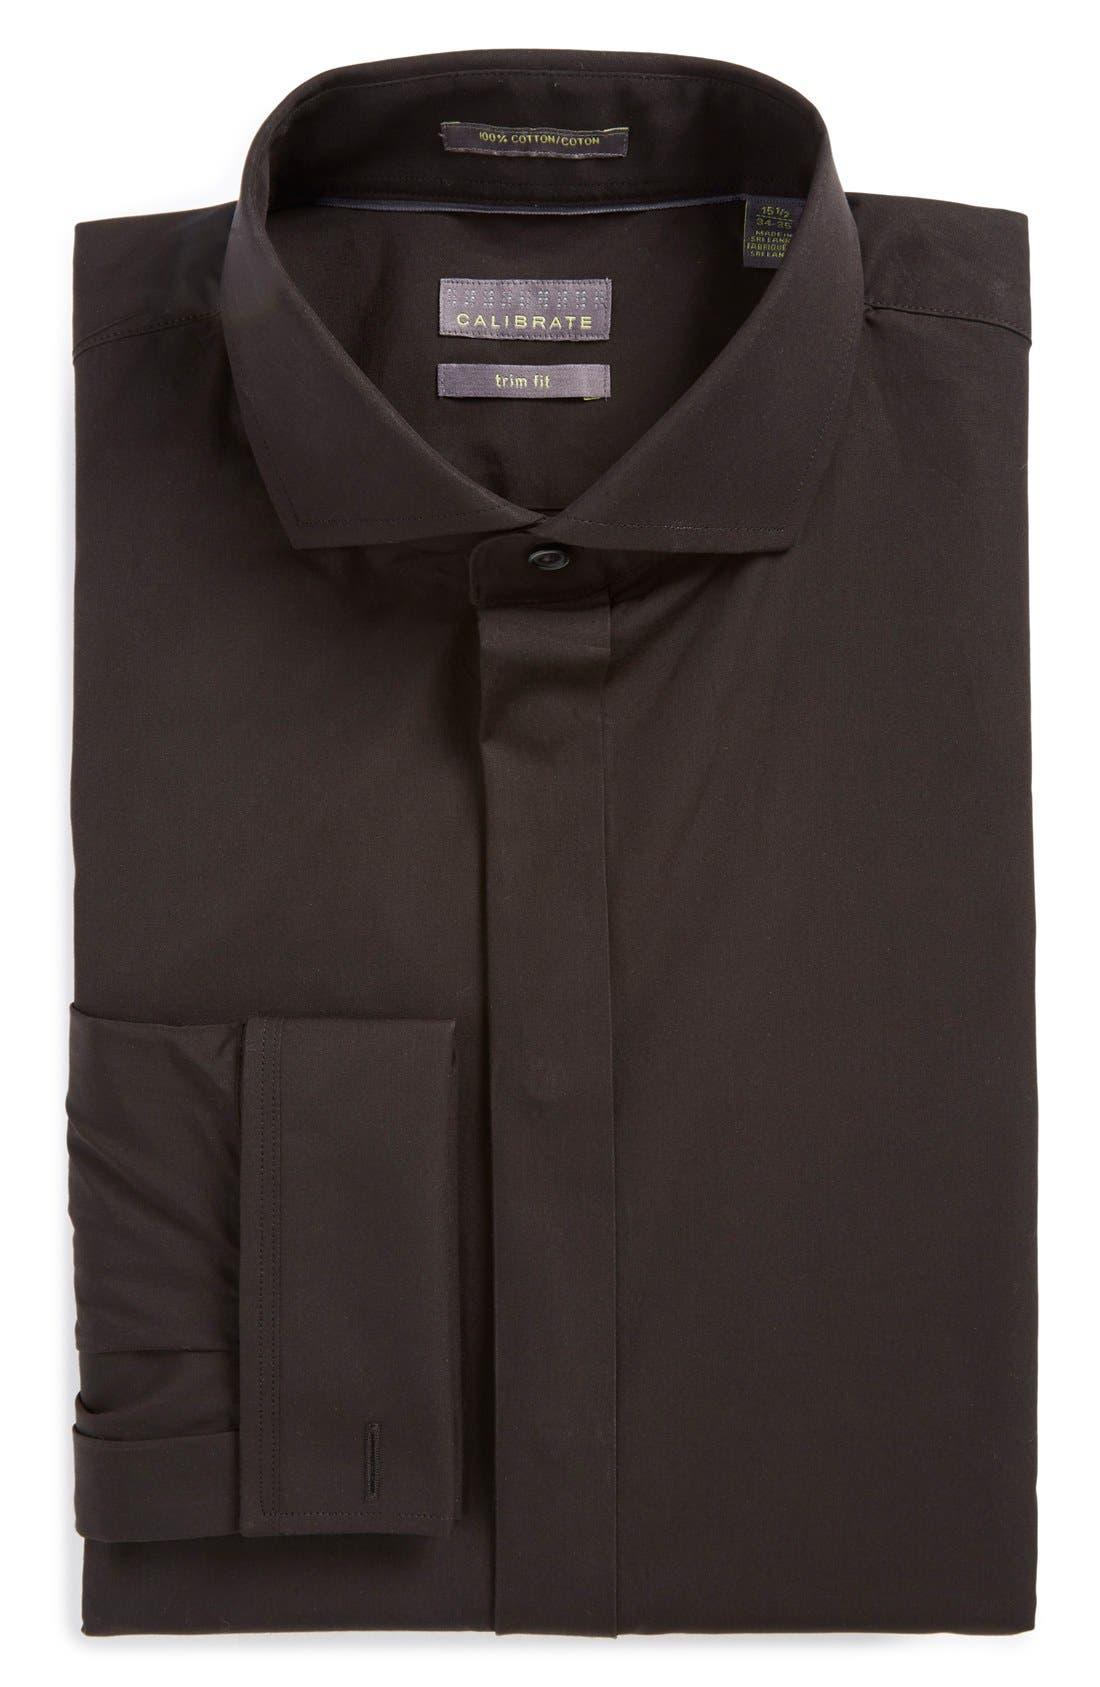 Main Image - Calibrate Trim Fit Solid Tuxedo Shirt